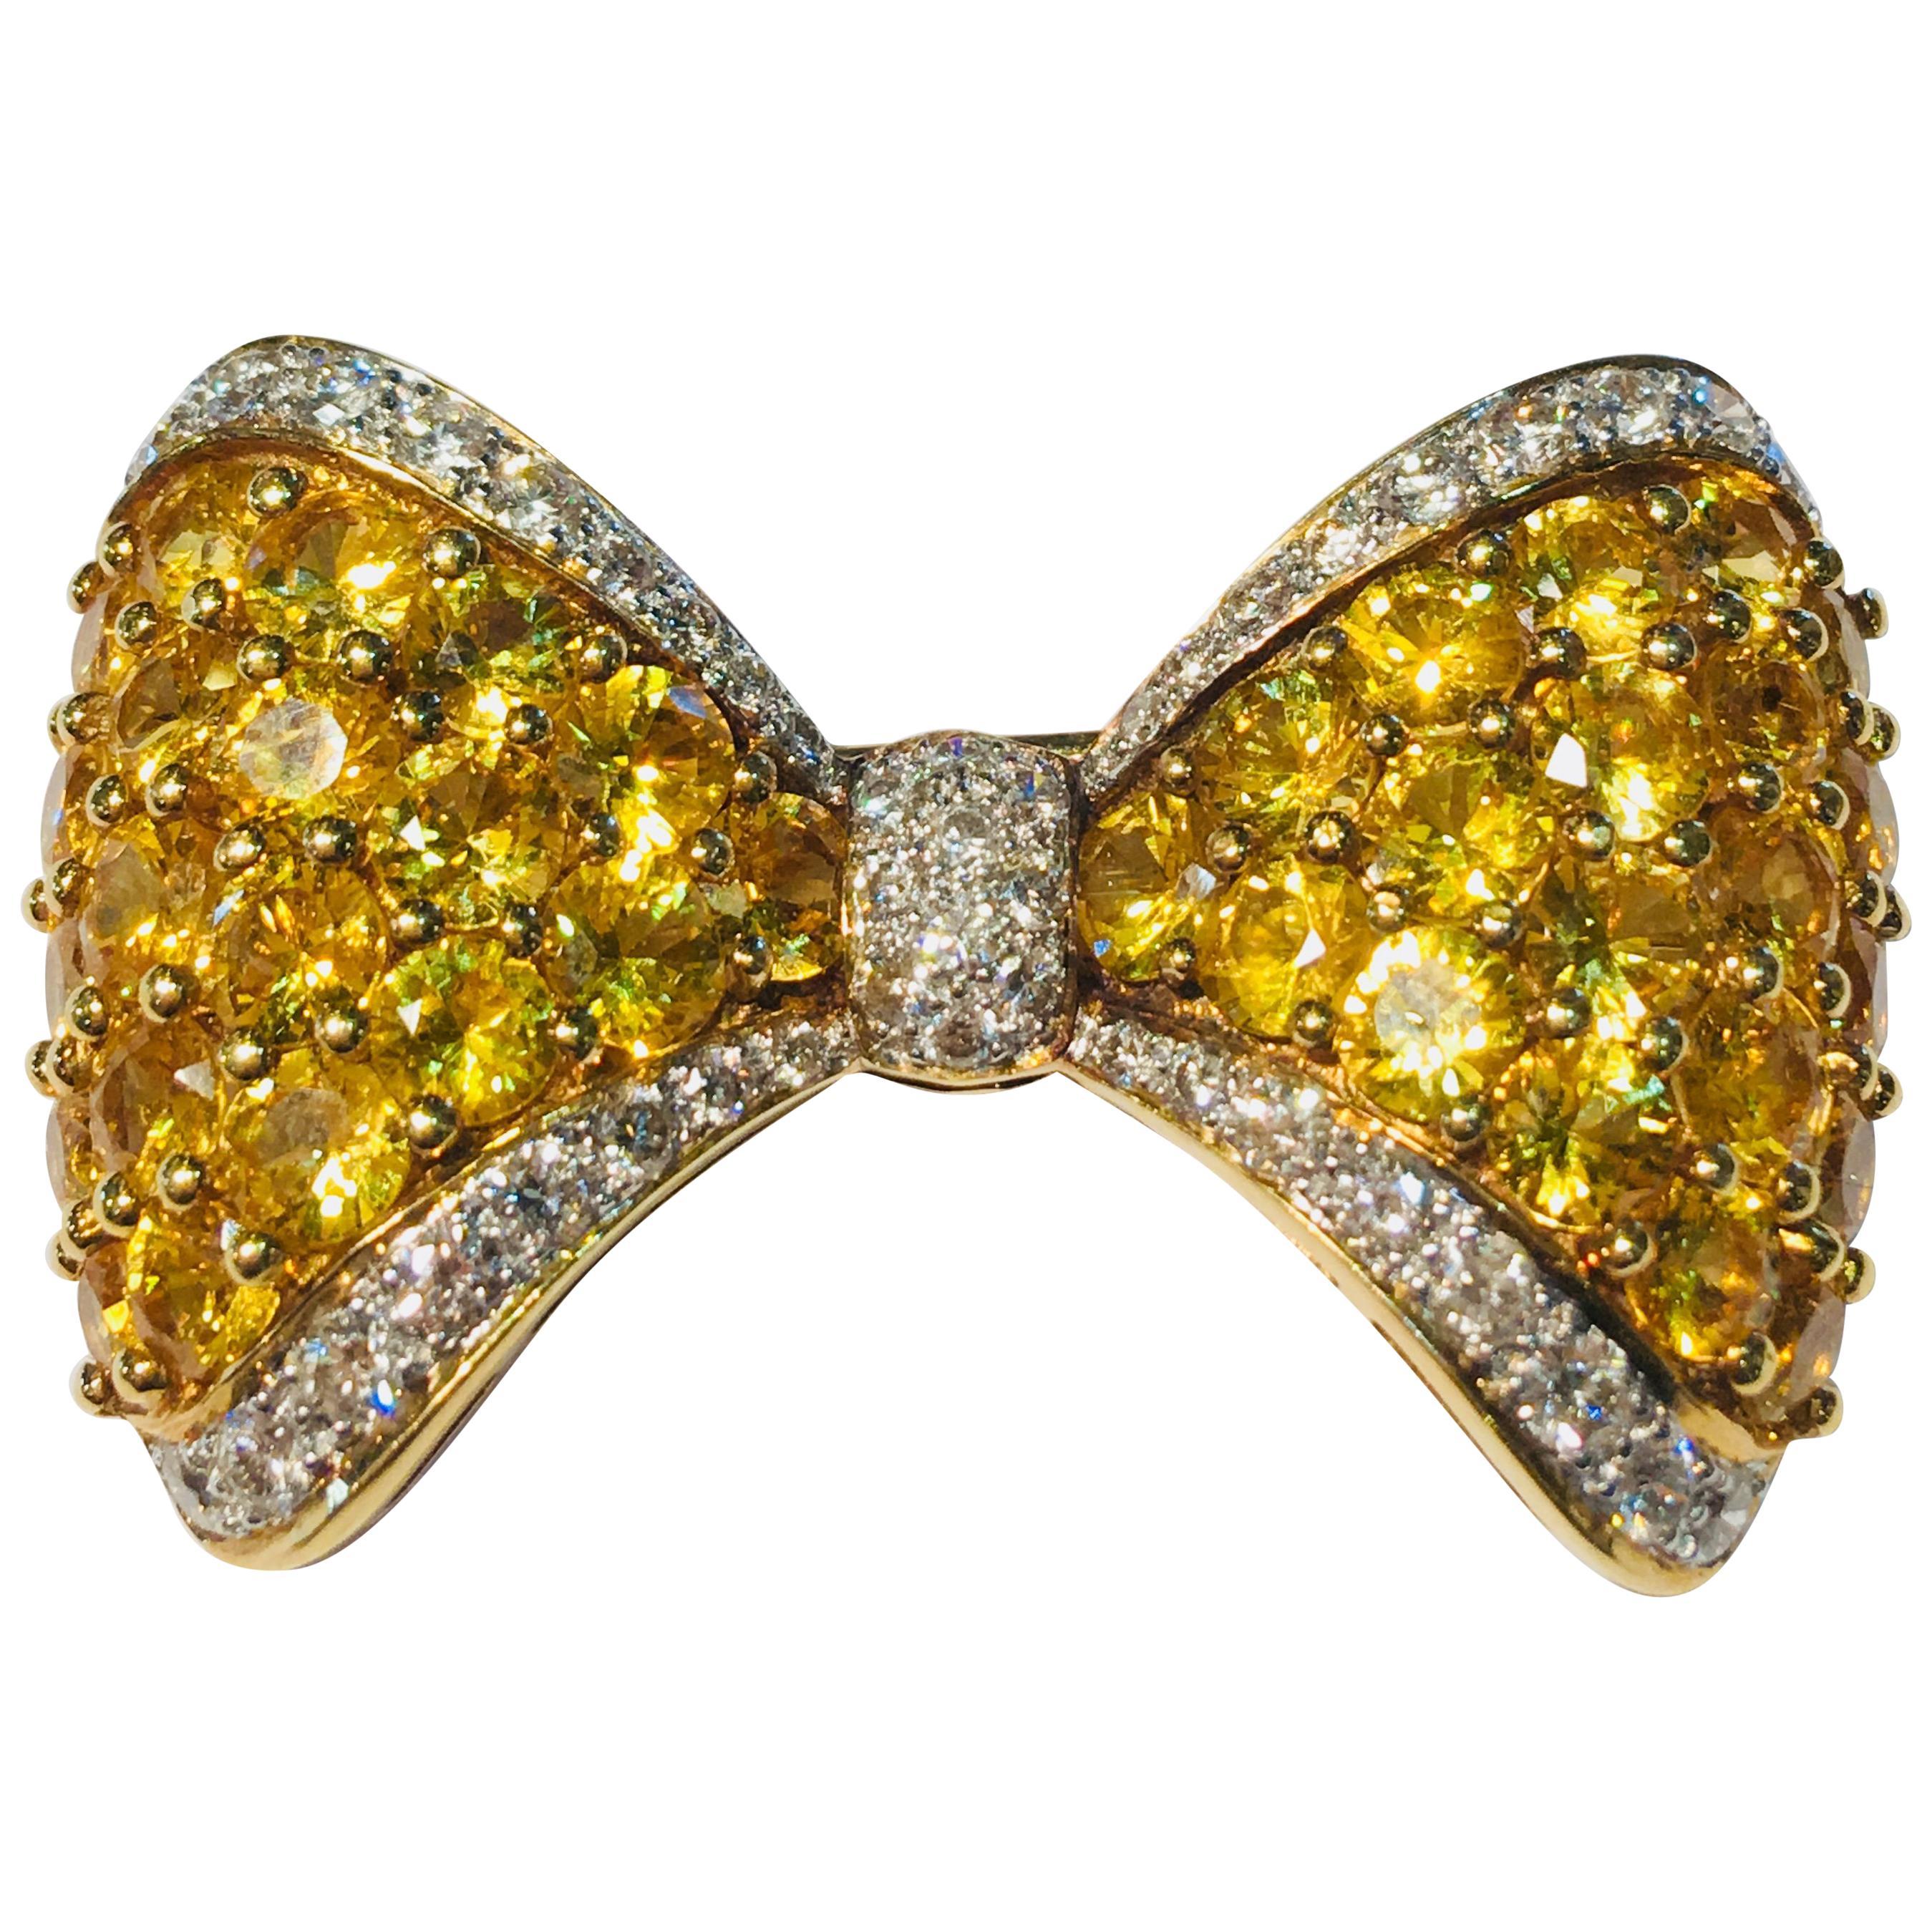 Yellow Sapphire White Diamond 18 Karat Gold Bow Tie Brooch Pin Over 7 Carat